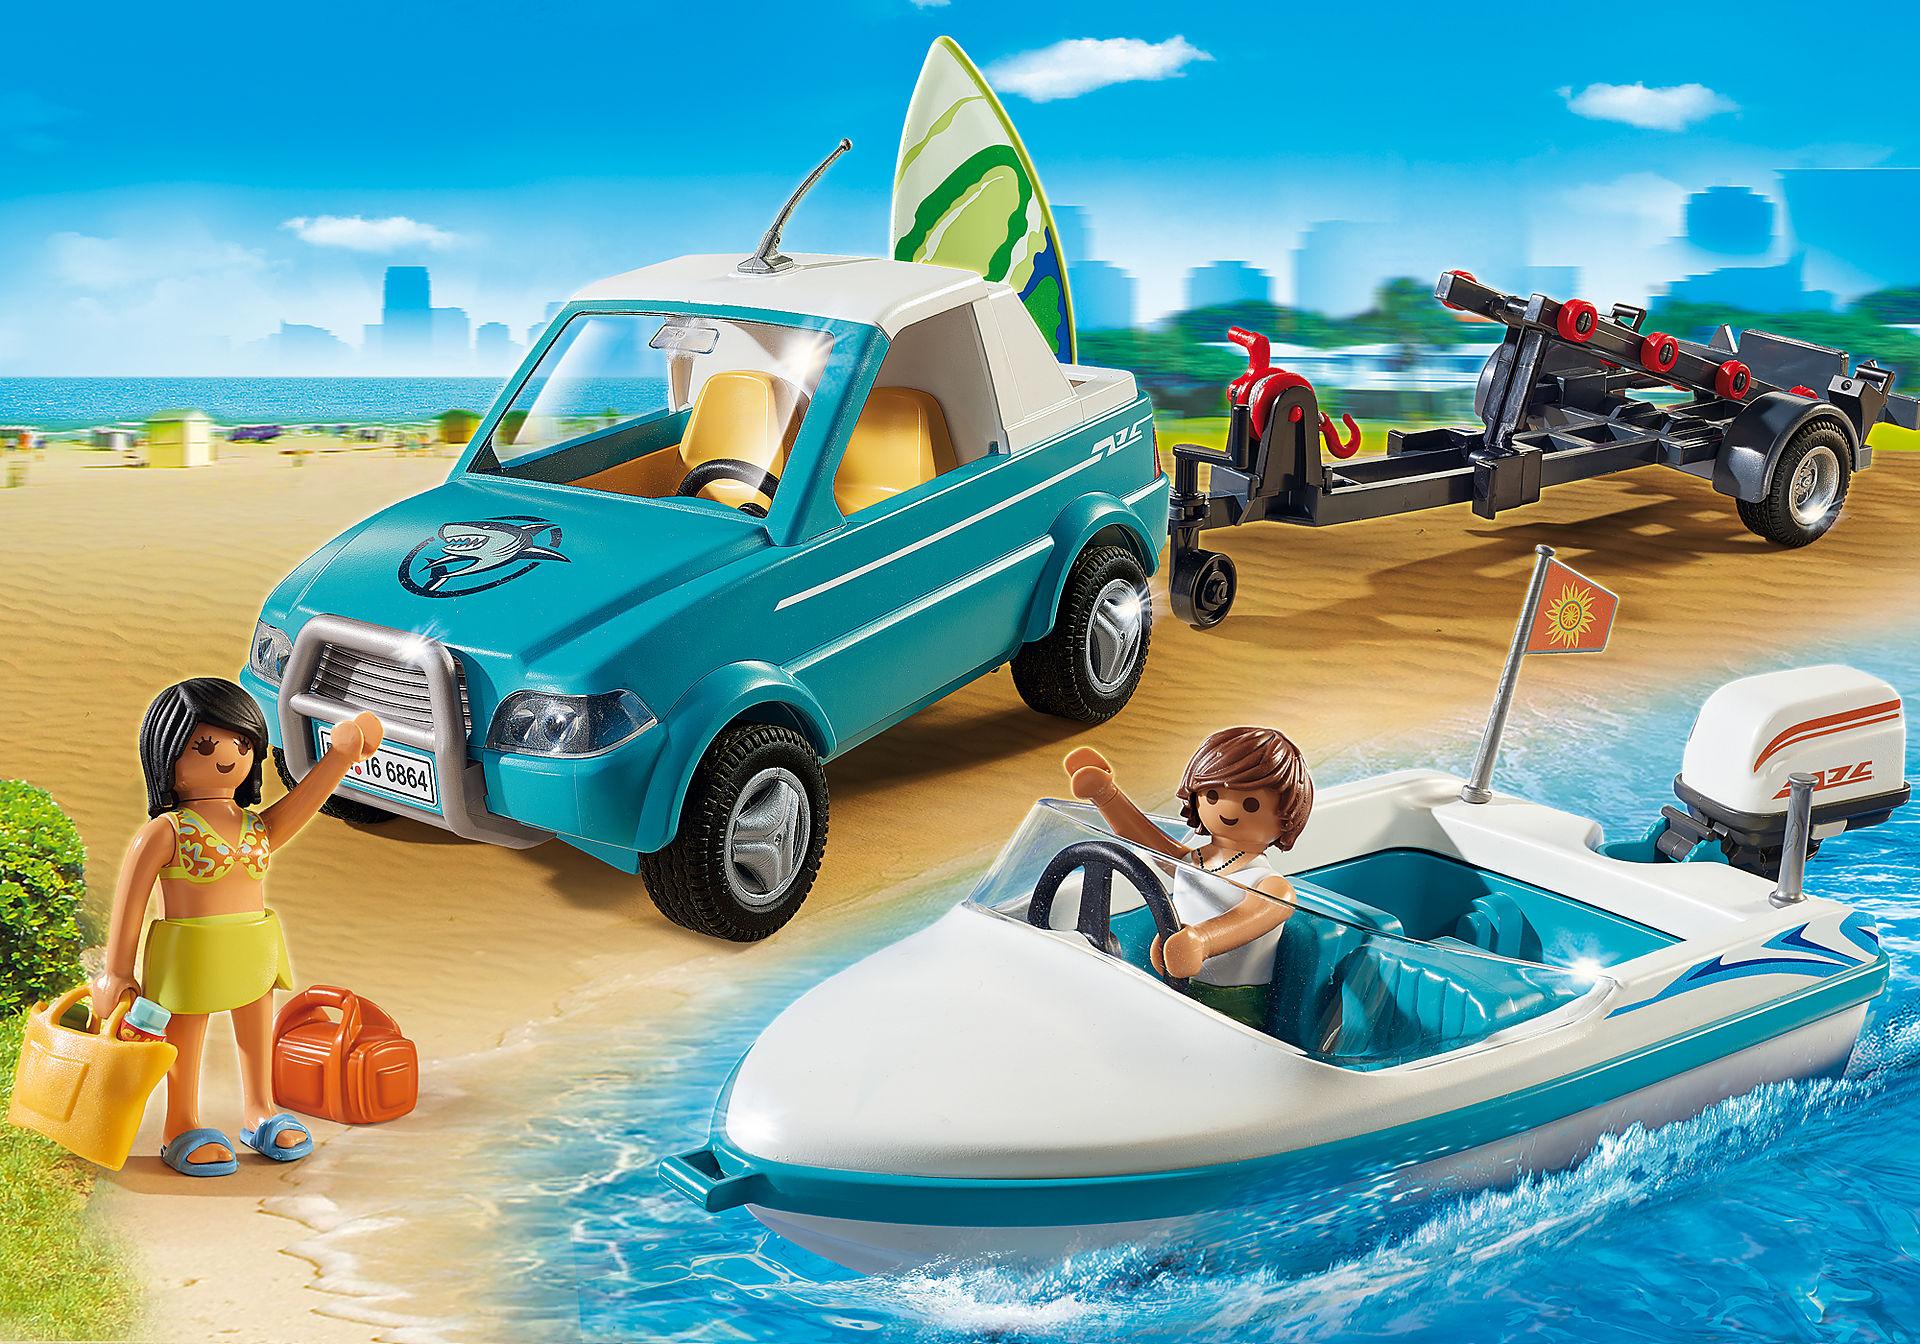 http://media.playmobil.com/i/playmobil/6864_product_detail/Pick-up com barco